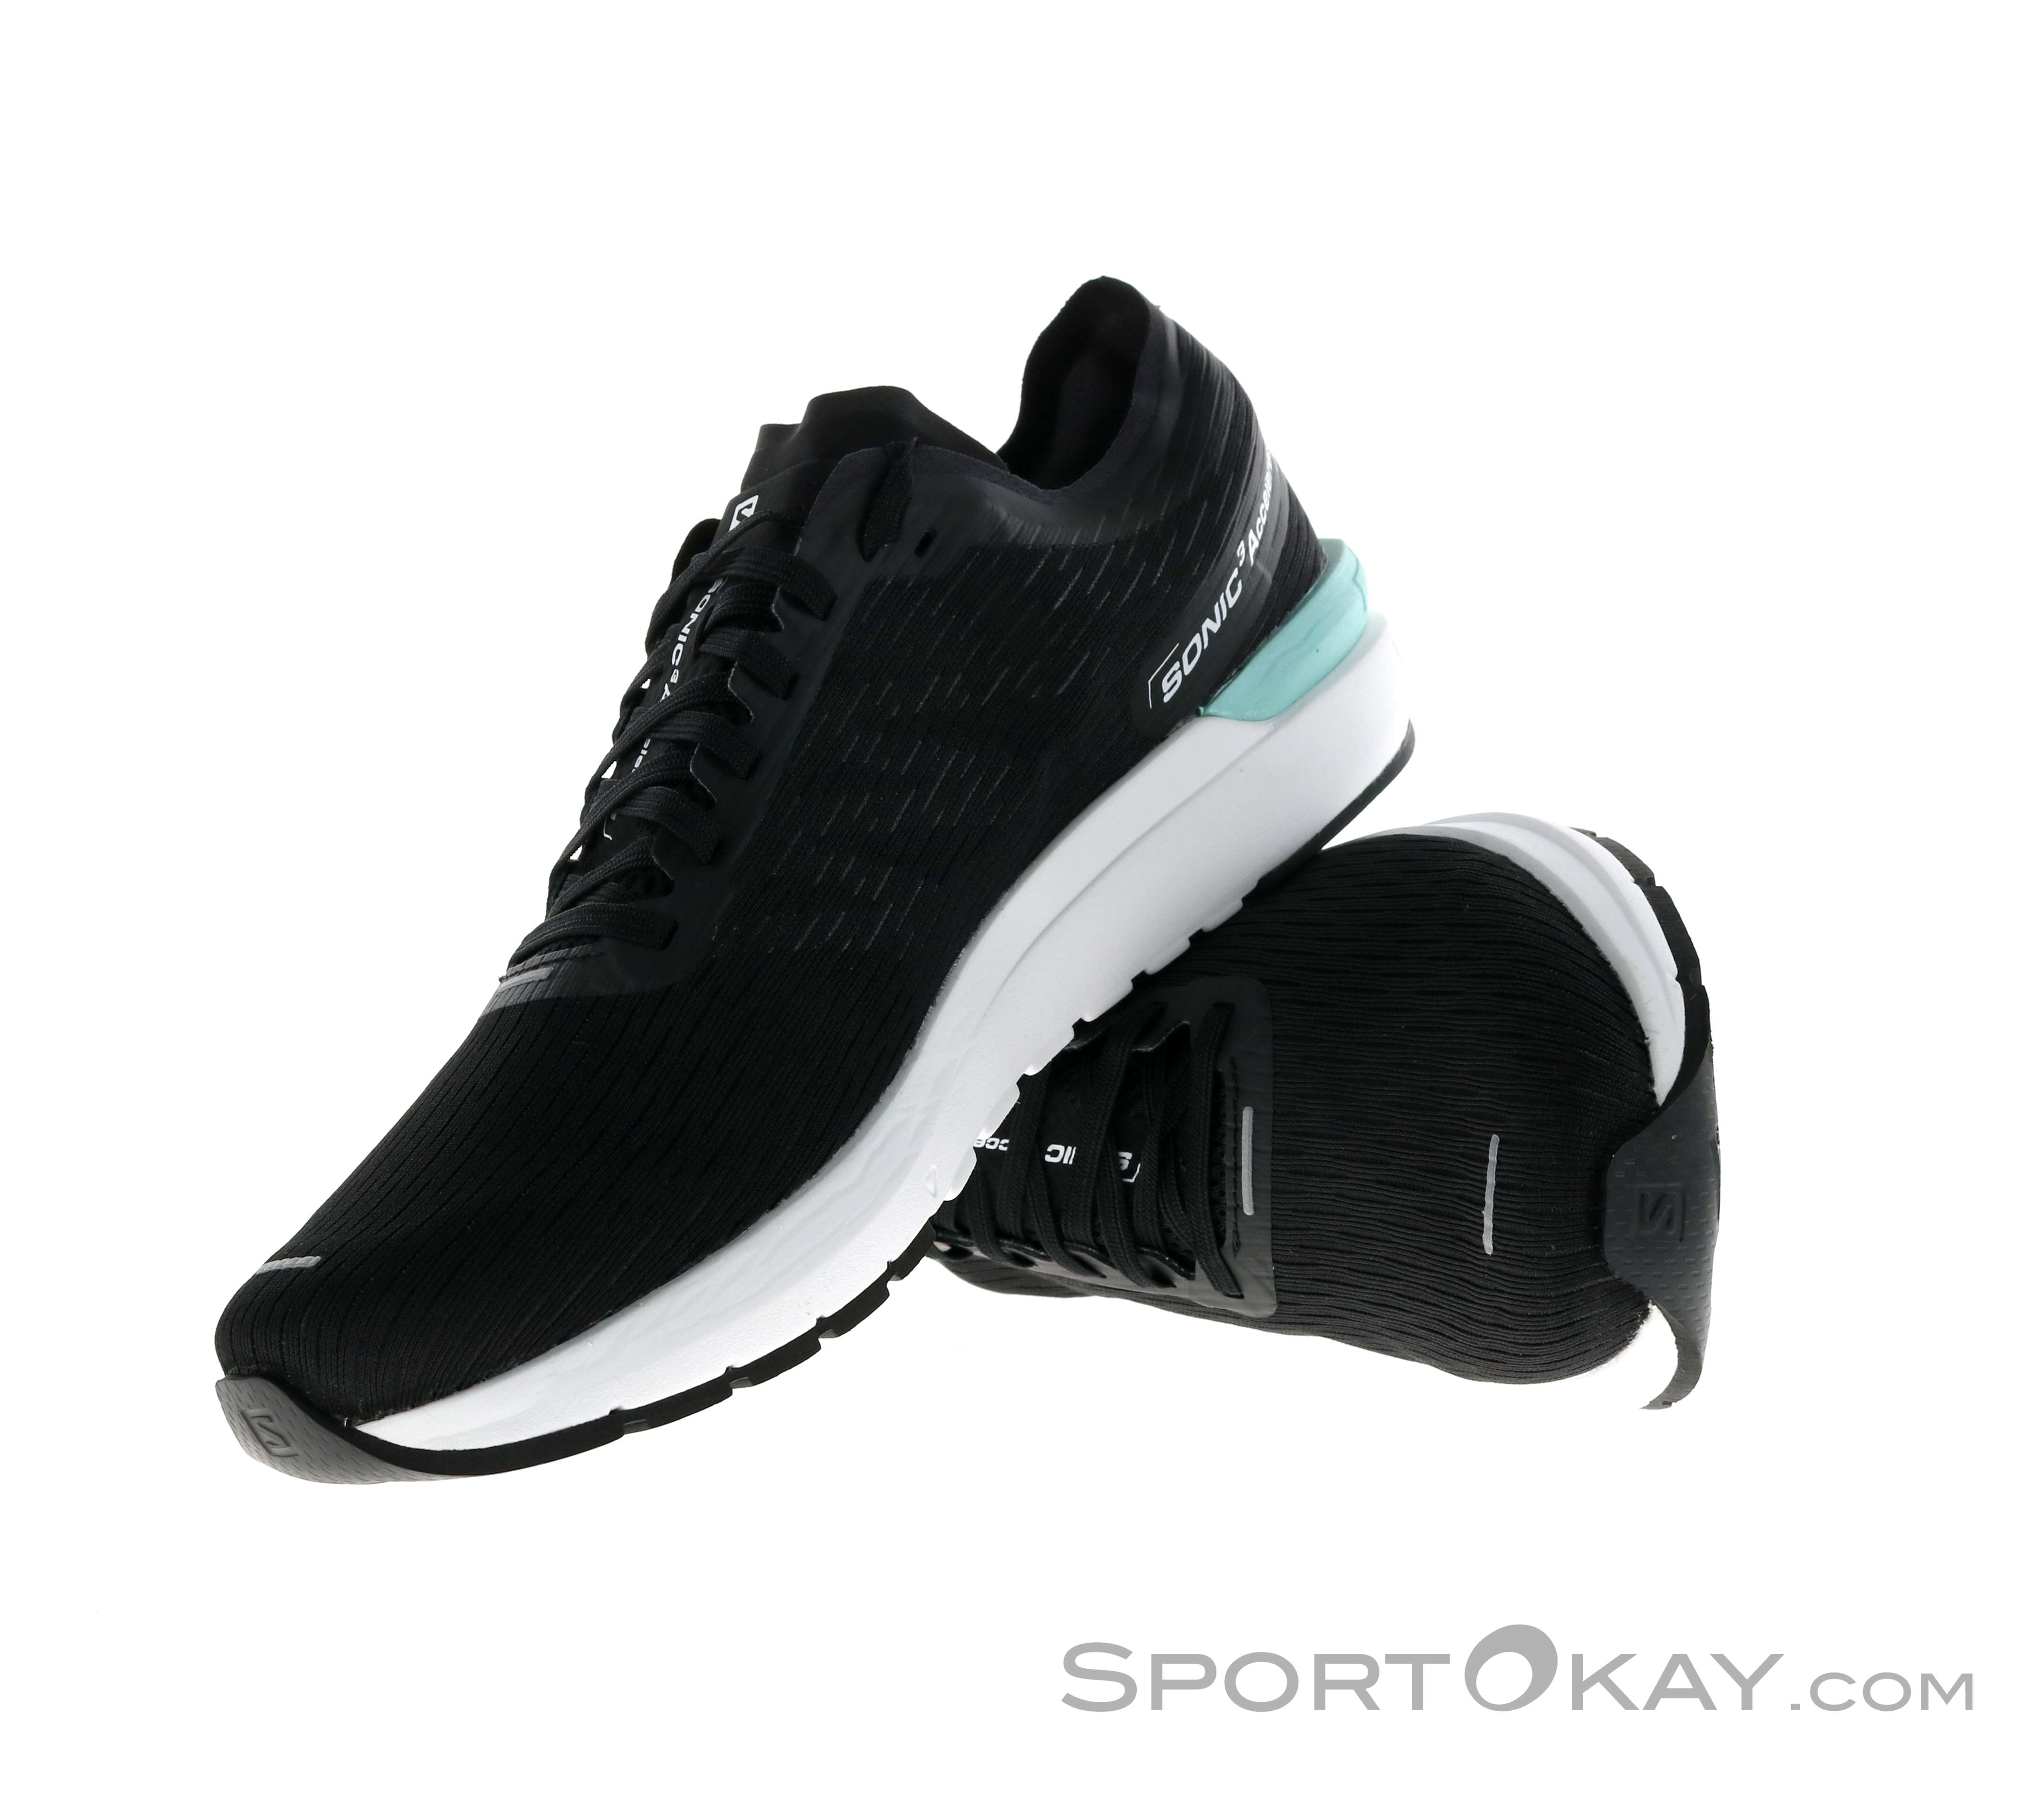 Salomon Sonic 3 Accelerate Mens Running Shoes Running